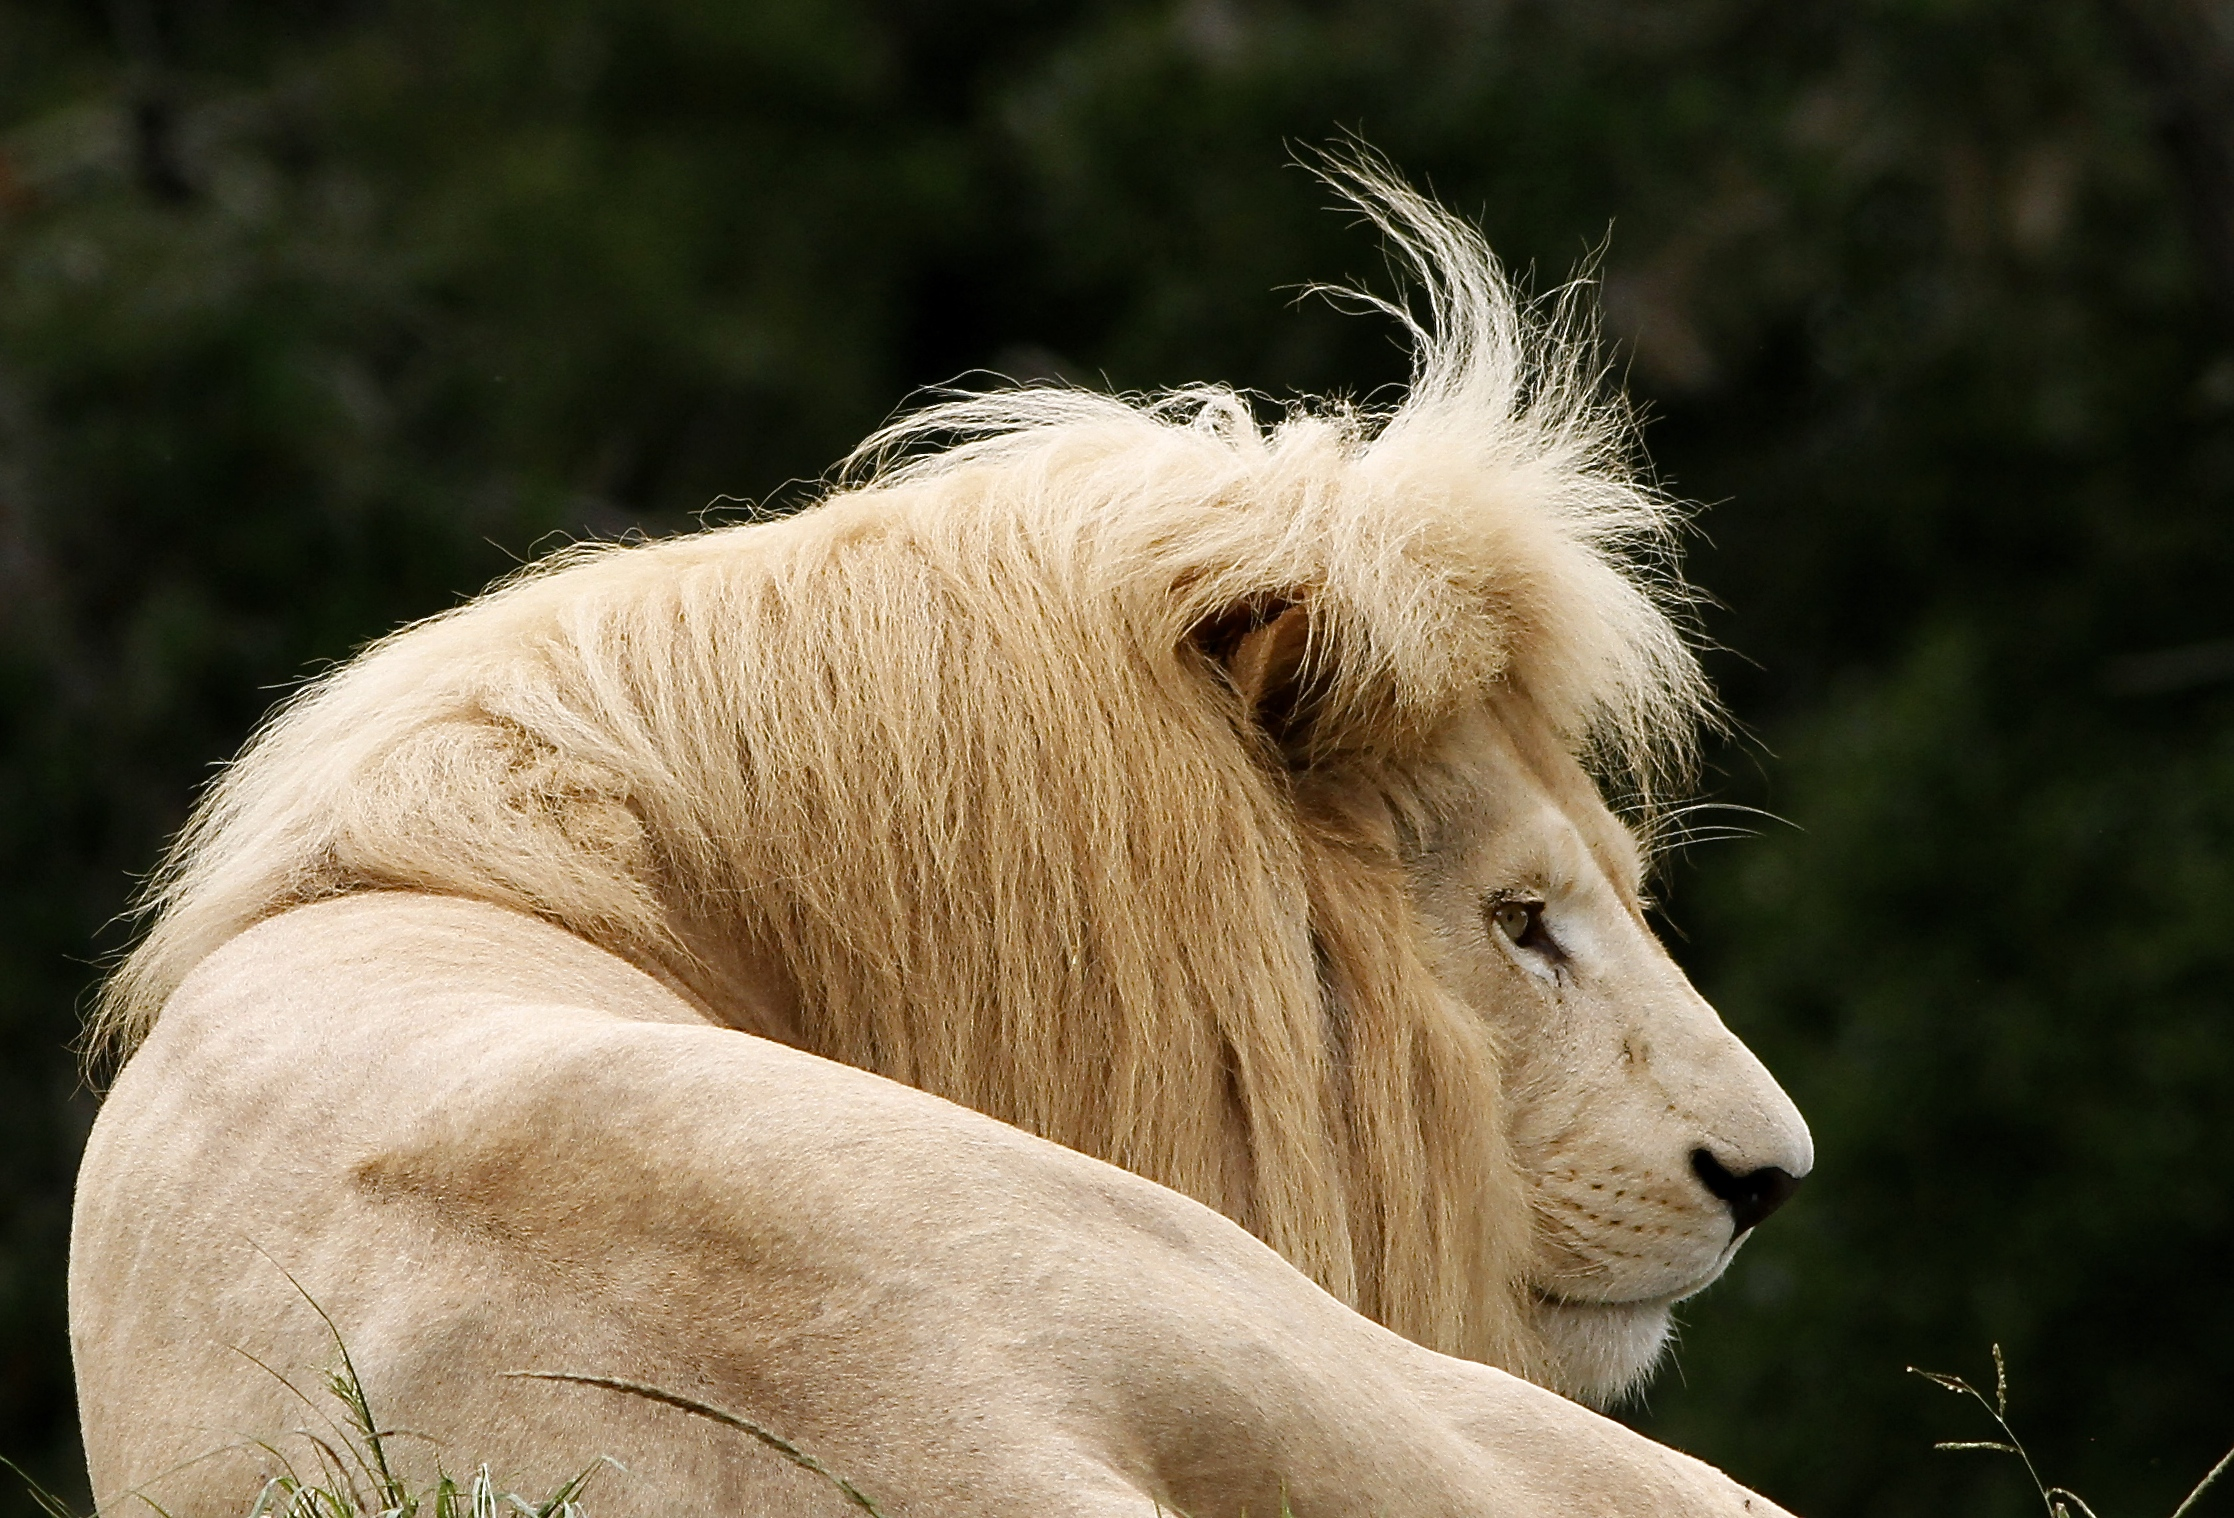 https://www.plettenbergbay.com/userfiles/images/Check-that-fringe-of-the-White-lion-at-Jukani.JPG